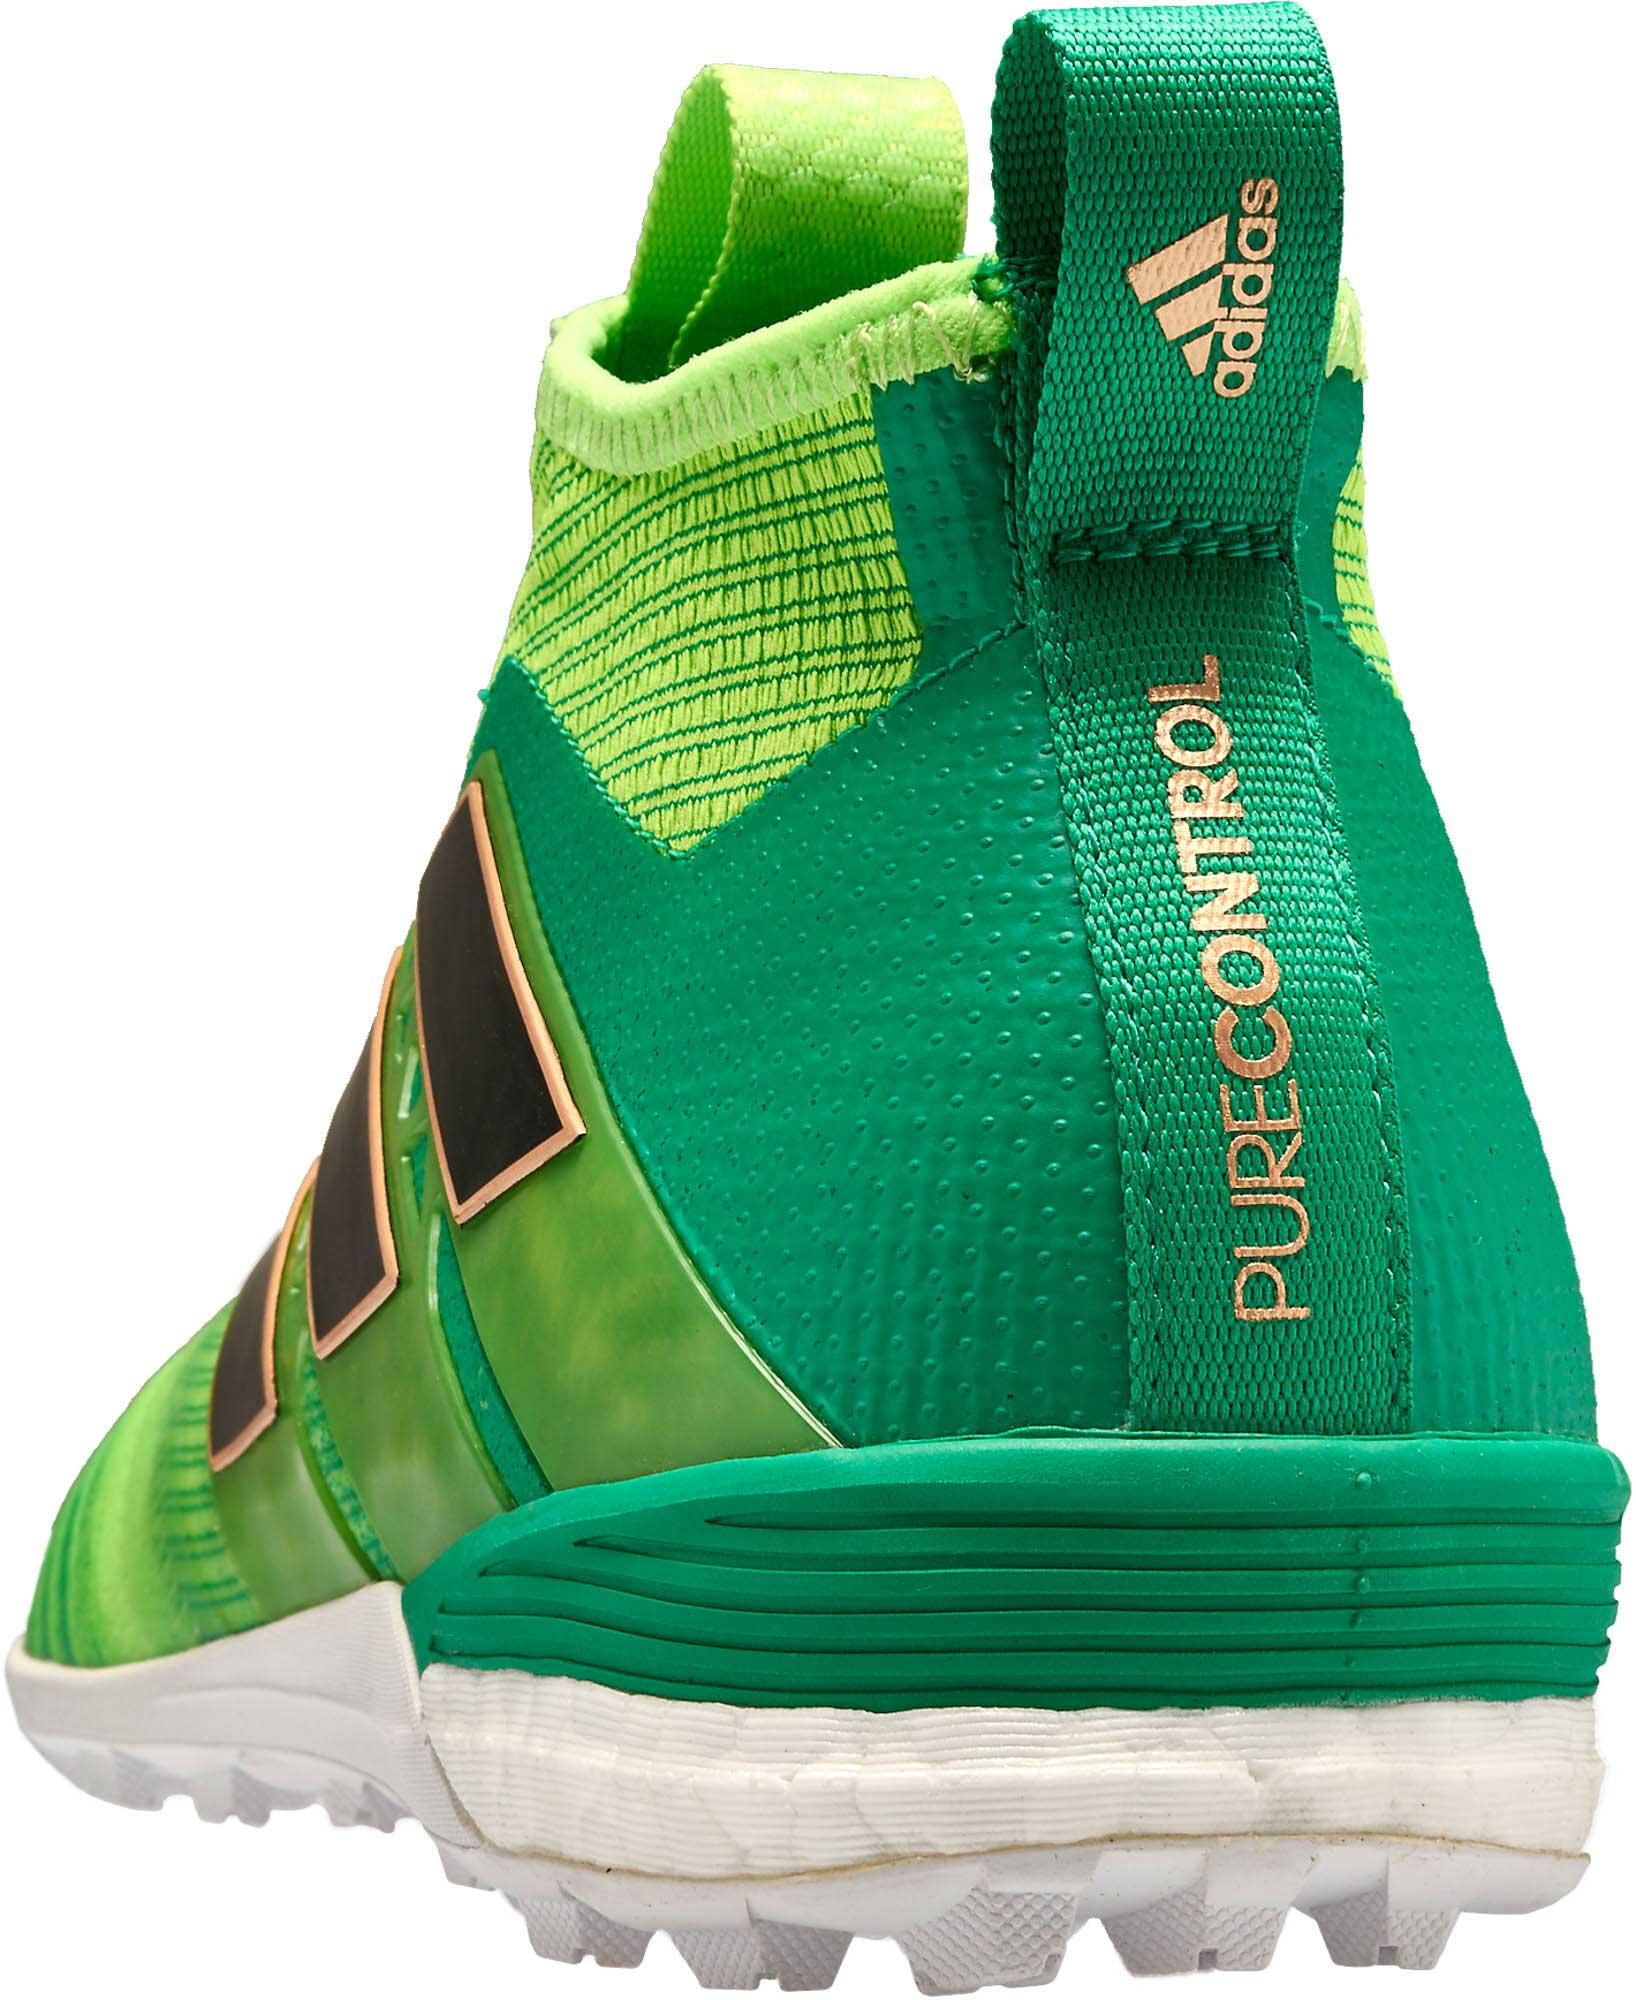 Adidas Herren Adidas Ace Tango 17+ Purecontrol Tf